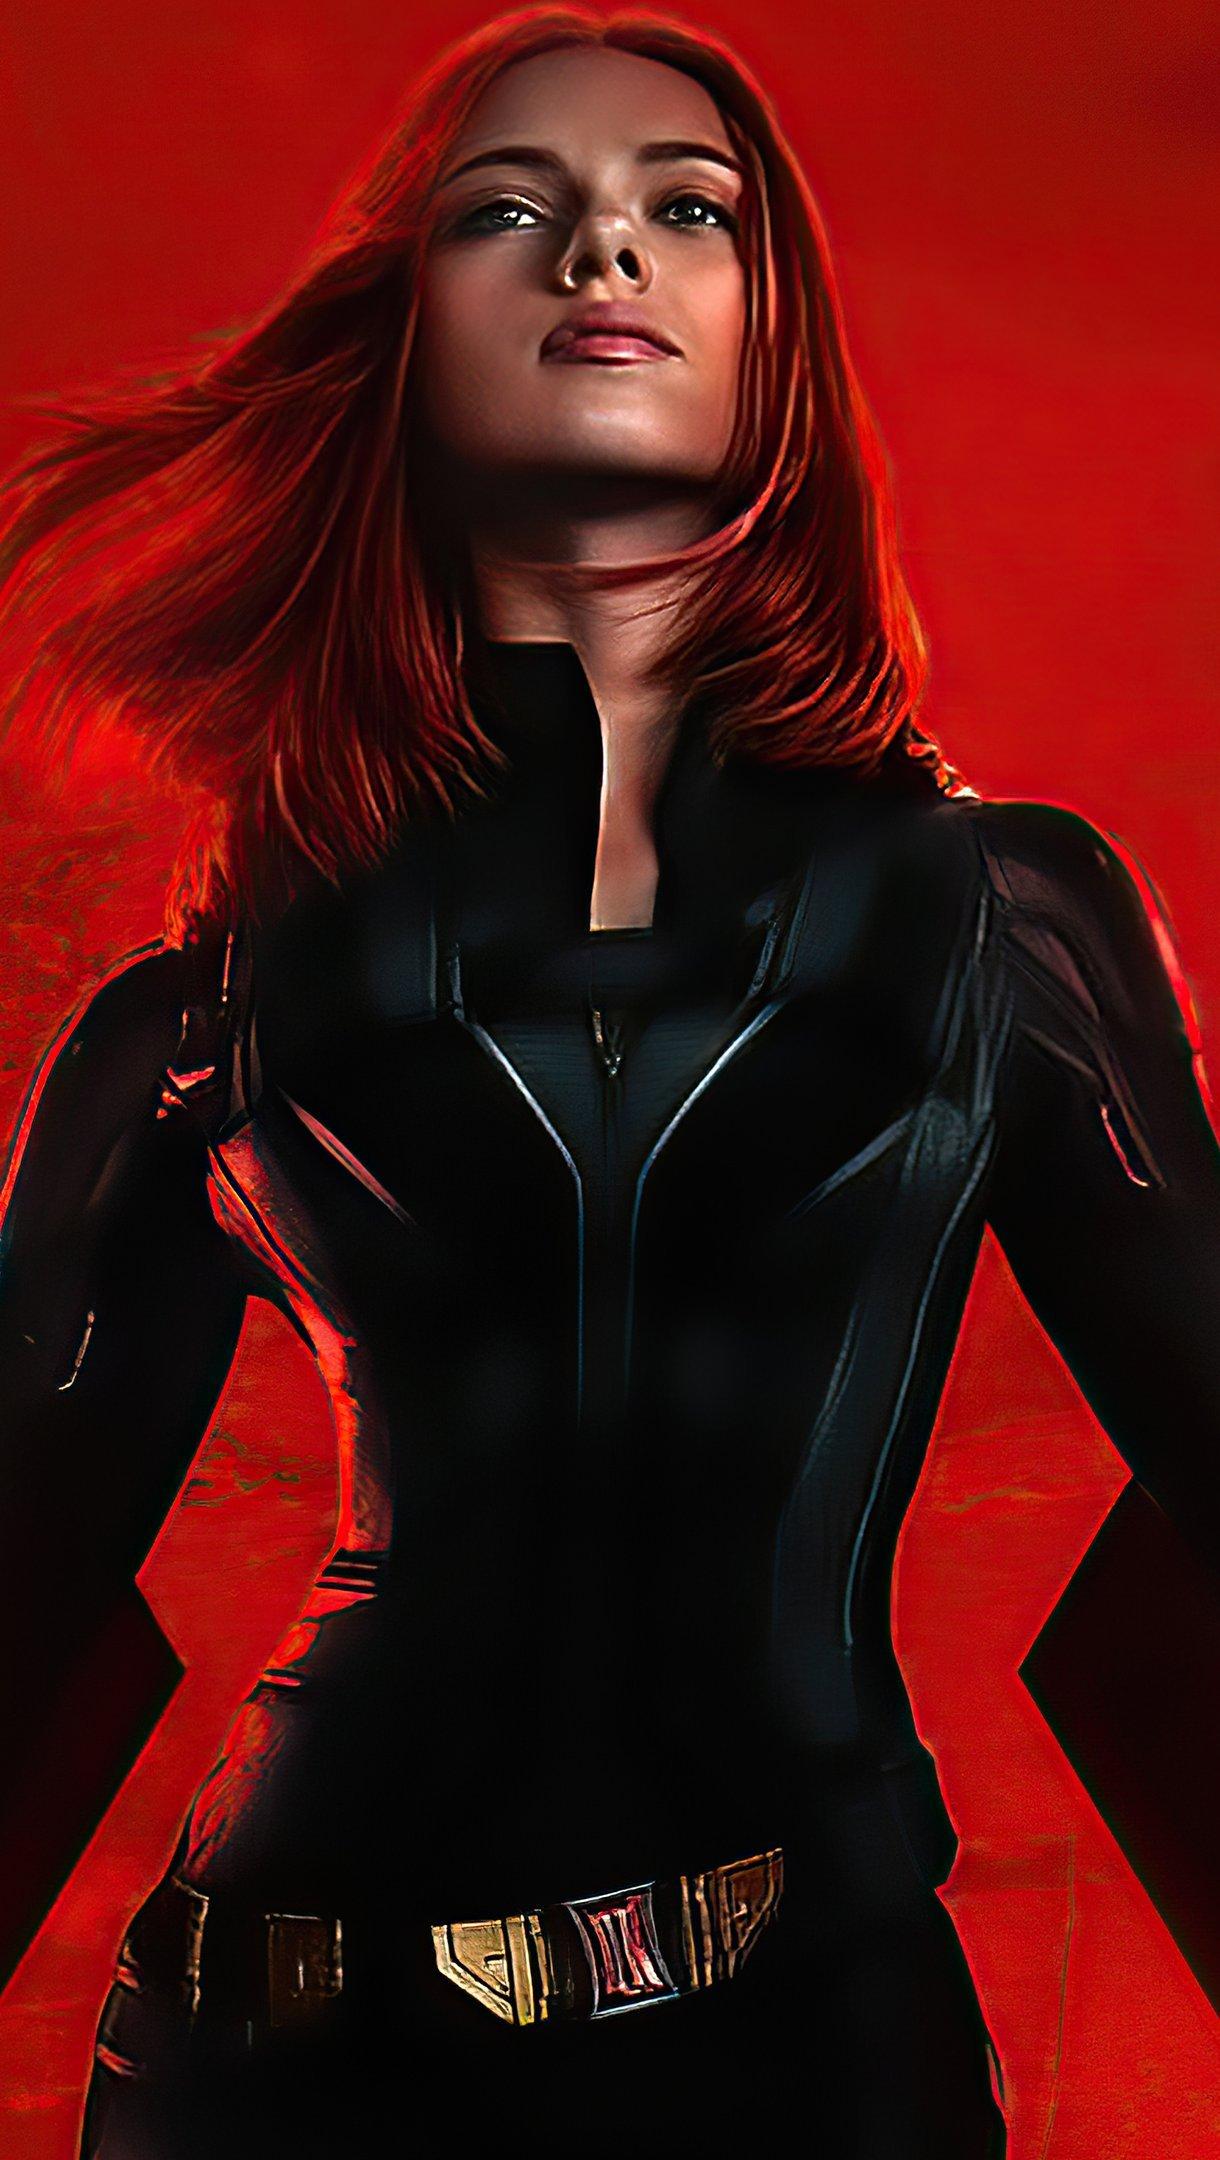 Wallpaper Black Widow Movie Vertical